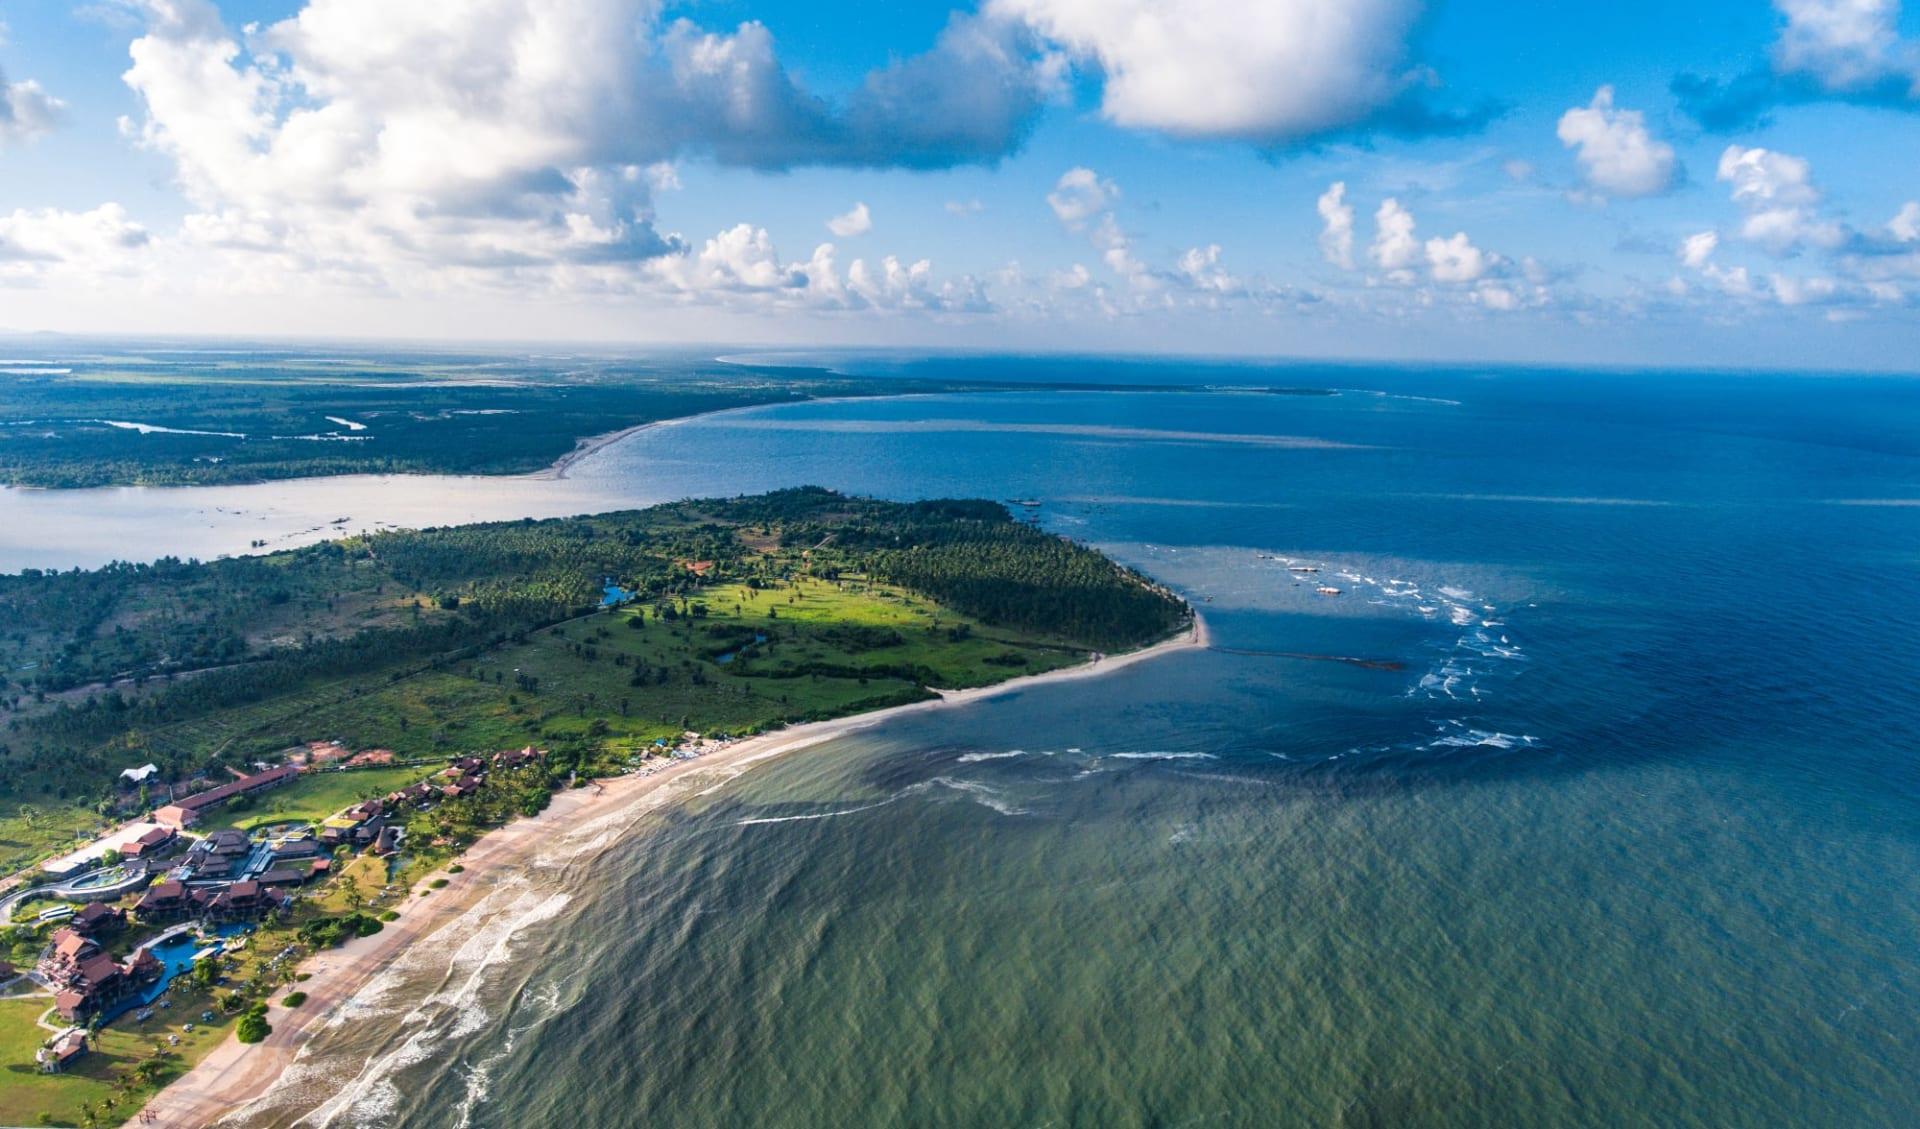 Amaya Beach in Passekudah: Amaya Beach Aerial View